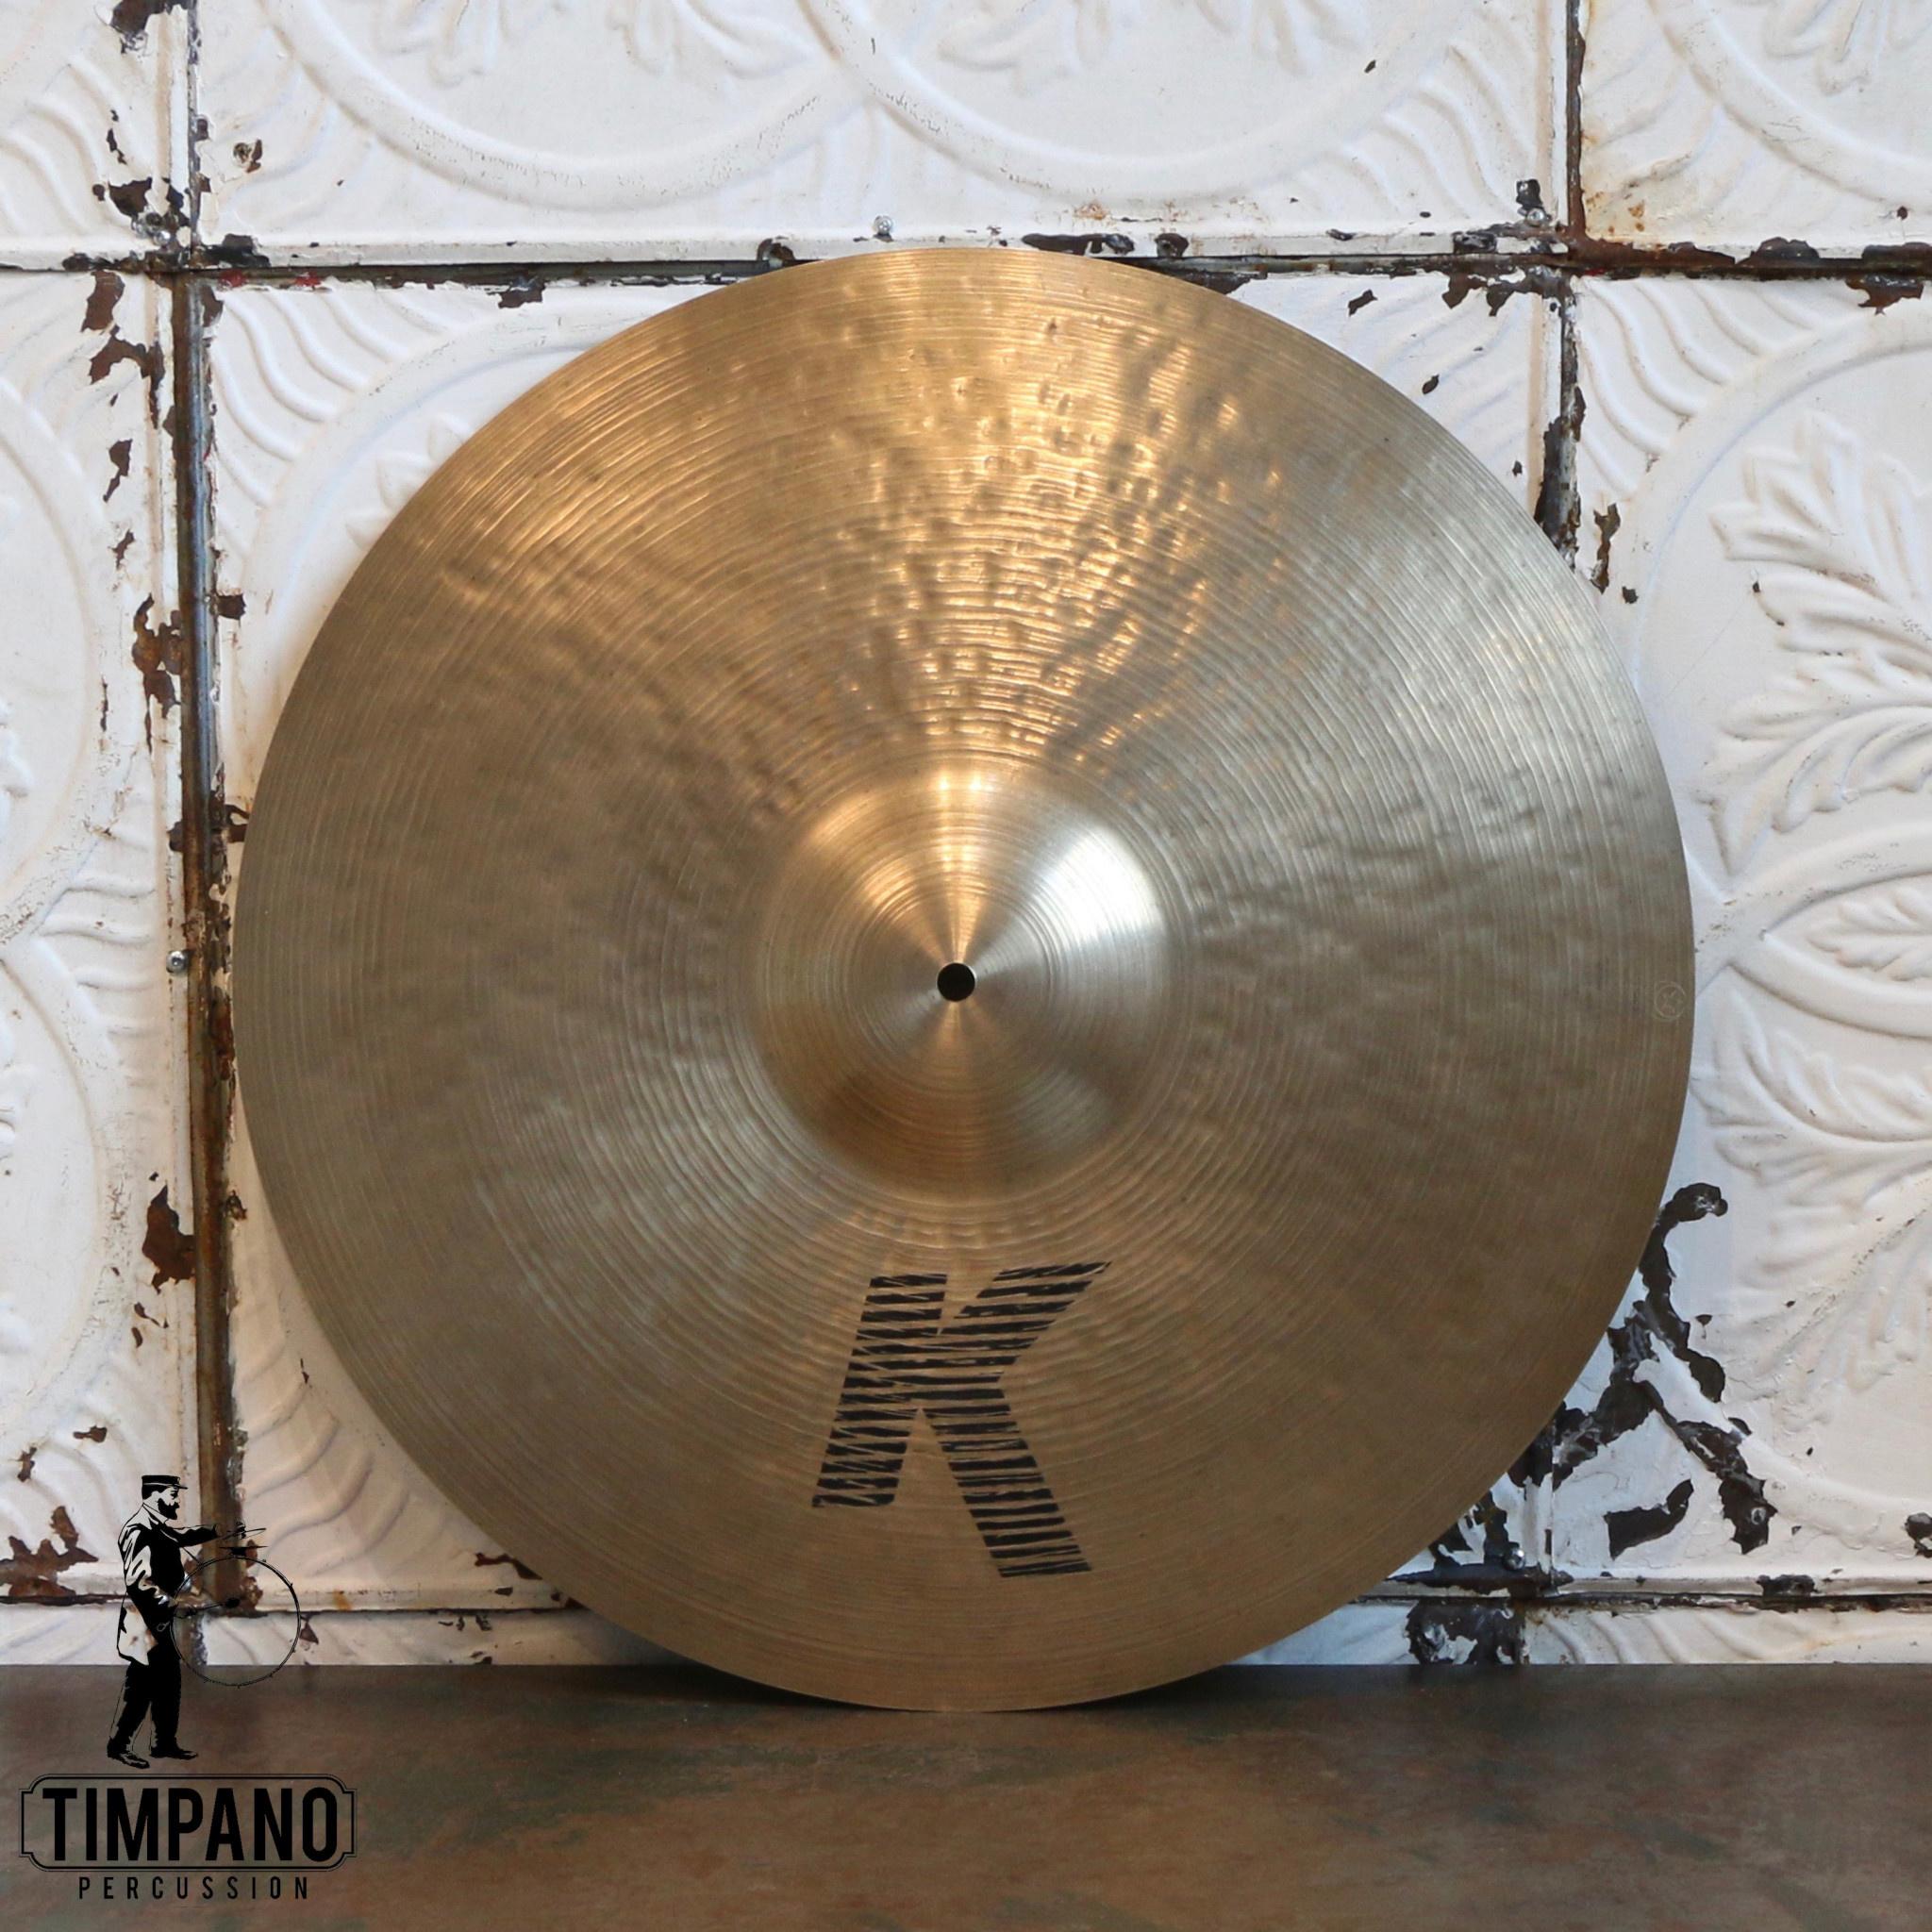 Zildjian Cymbale ride usagée Zildjian (80's) K Light 20po